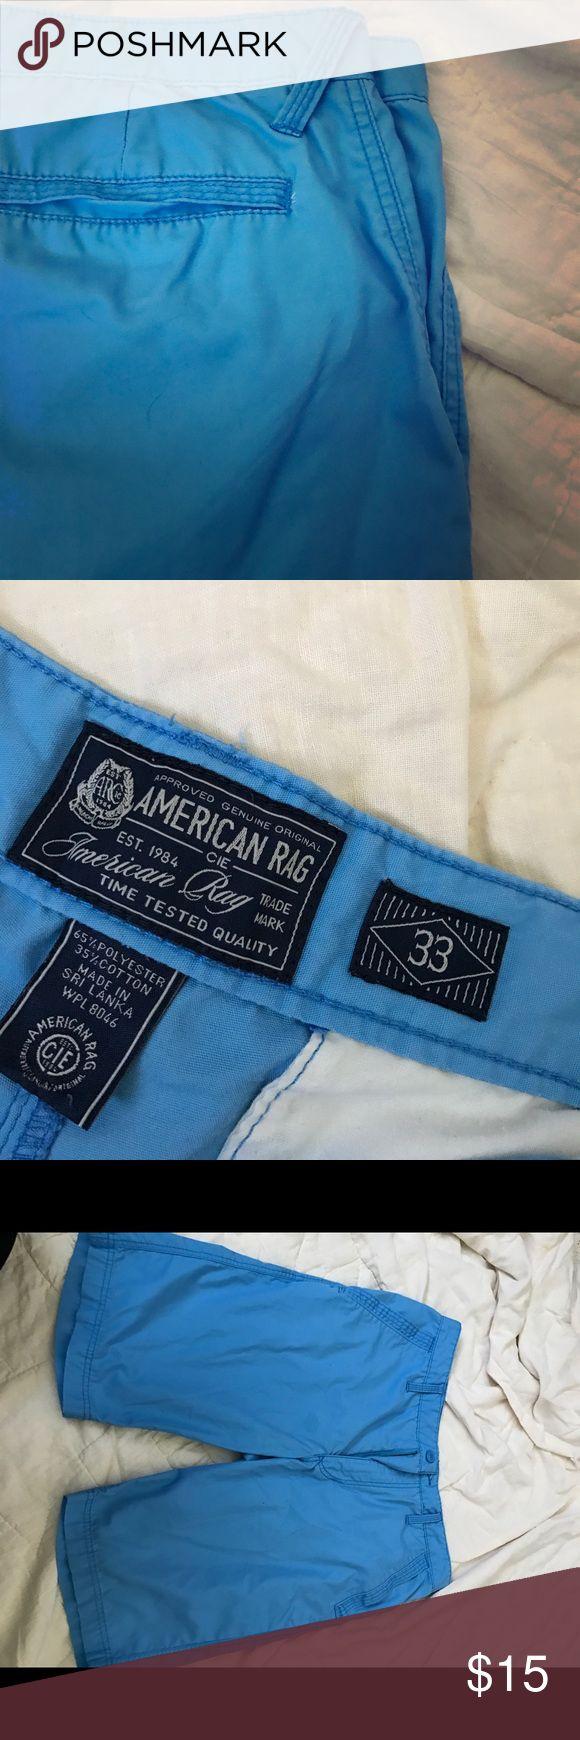 American Rag men's shorts Like new blue shorts for men by American Rag! American Rag Shorts Flat Front